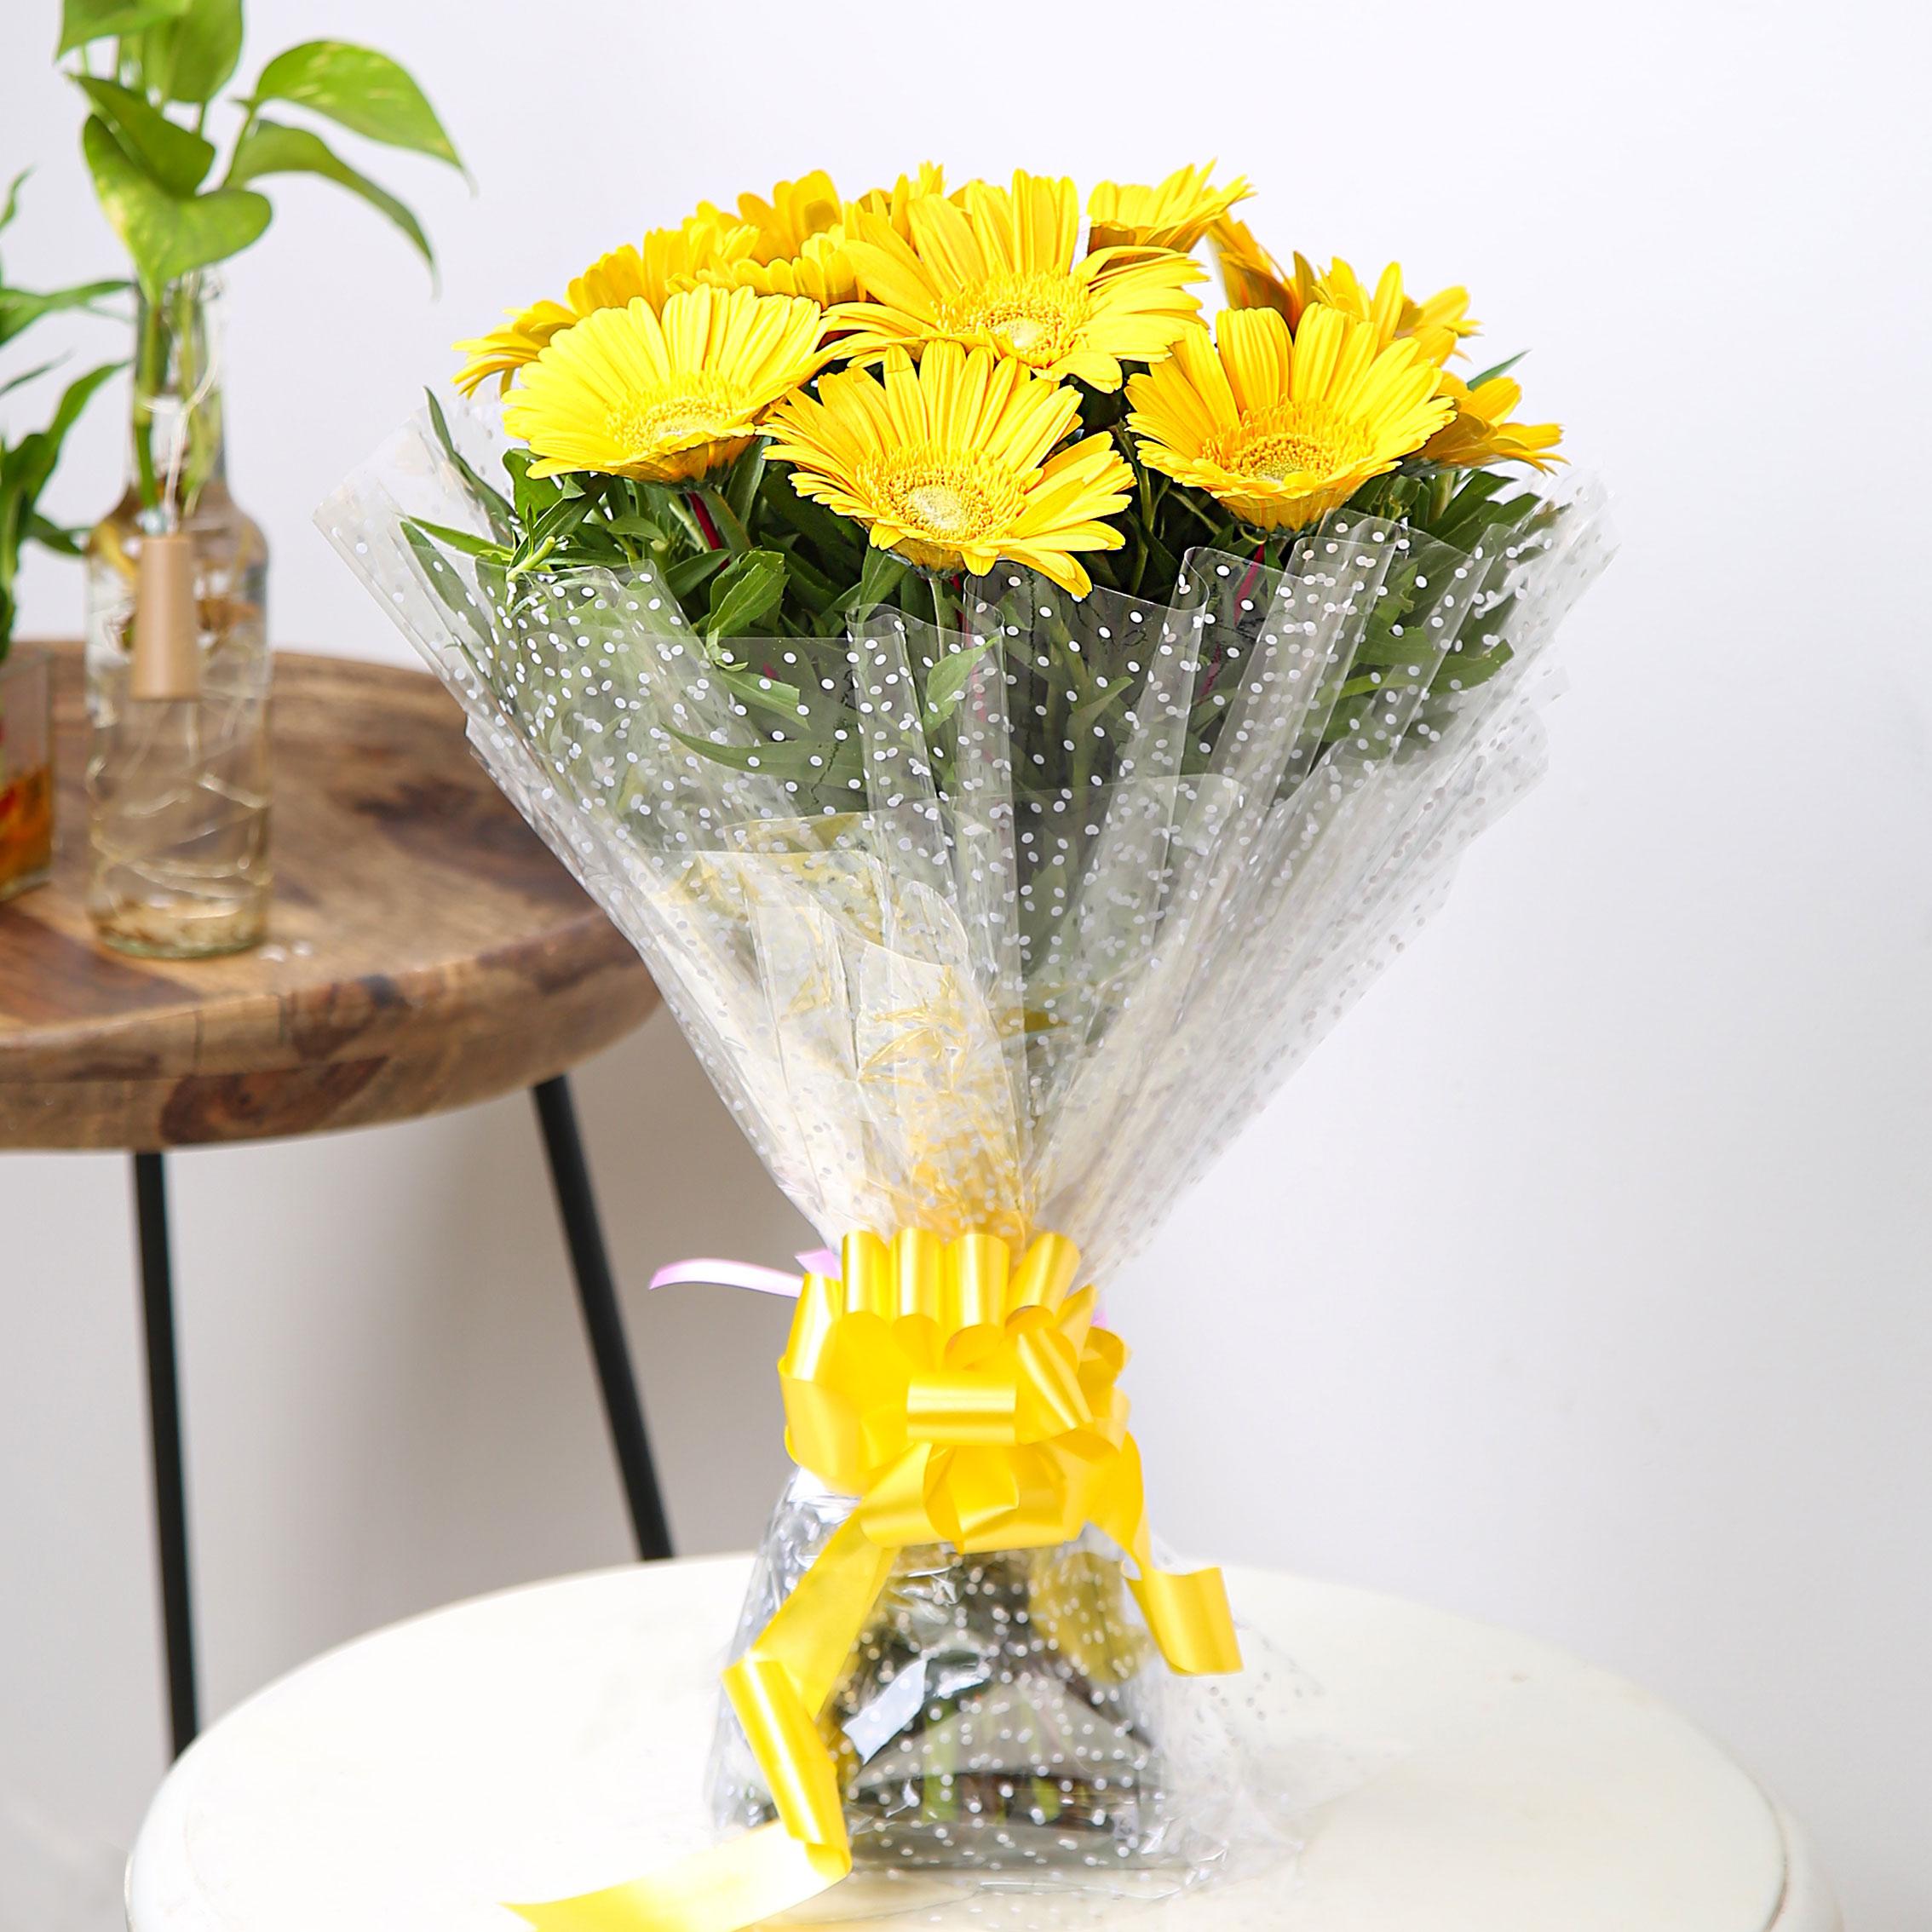 Image 1 of 10 Yellow Gerberas